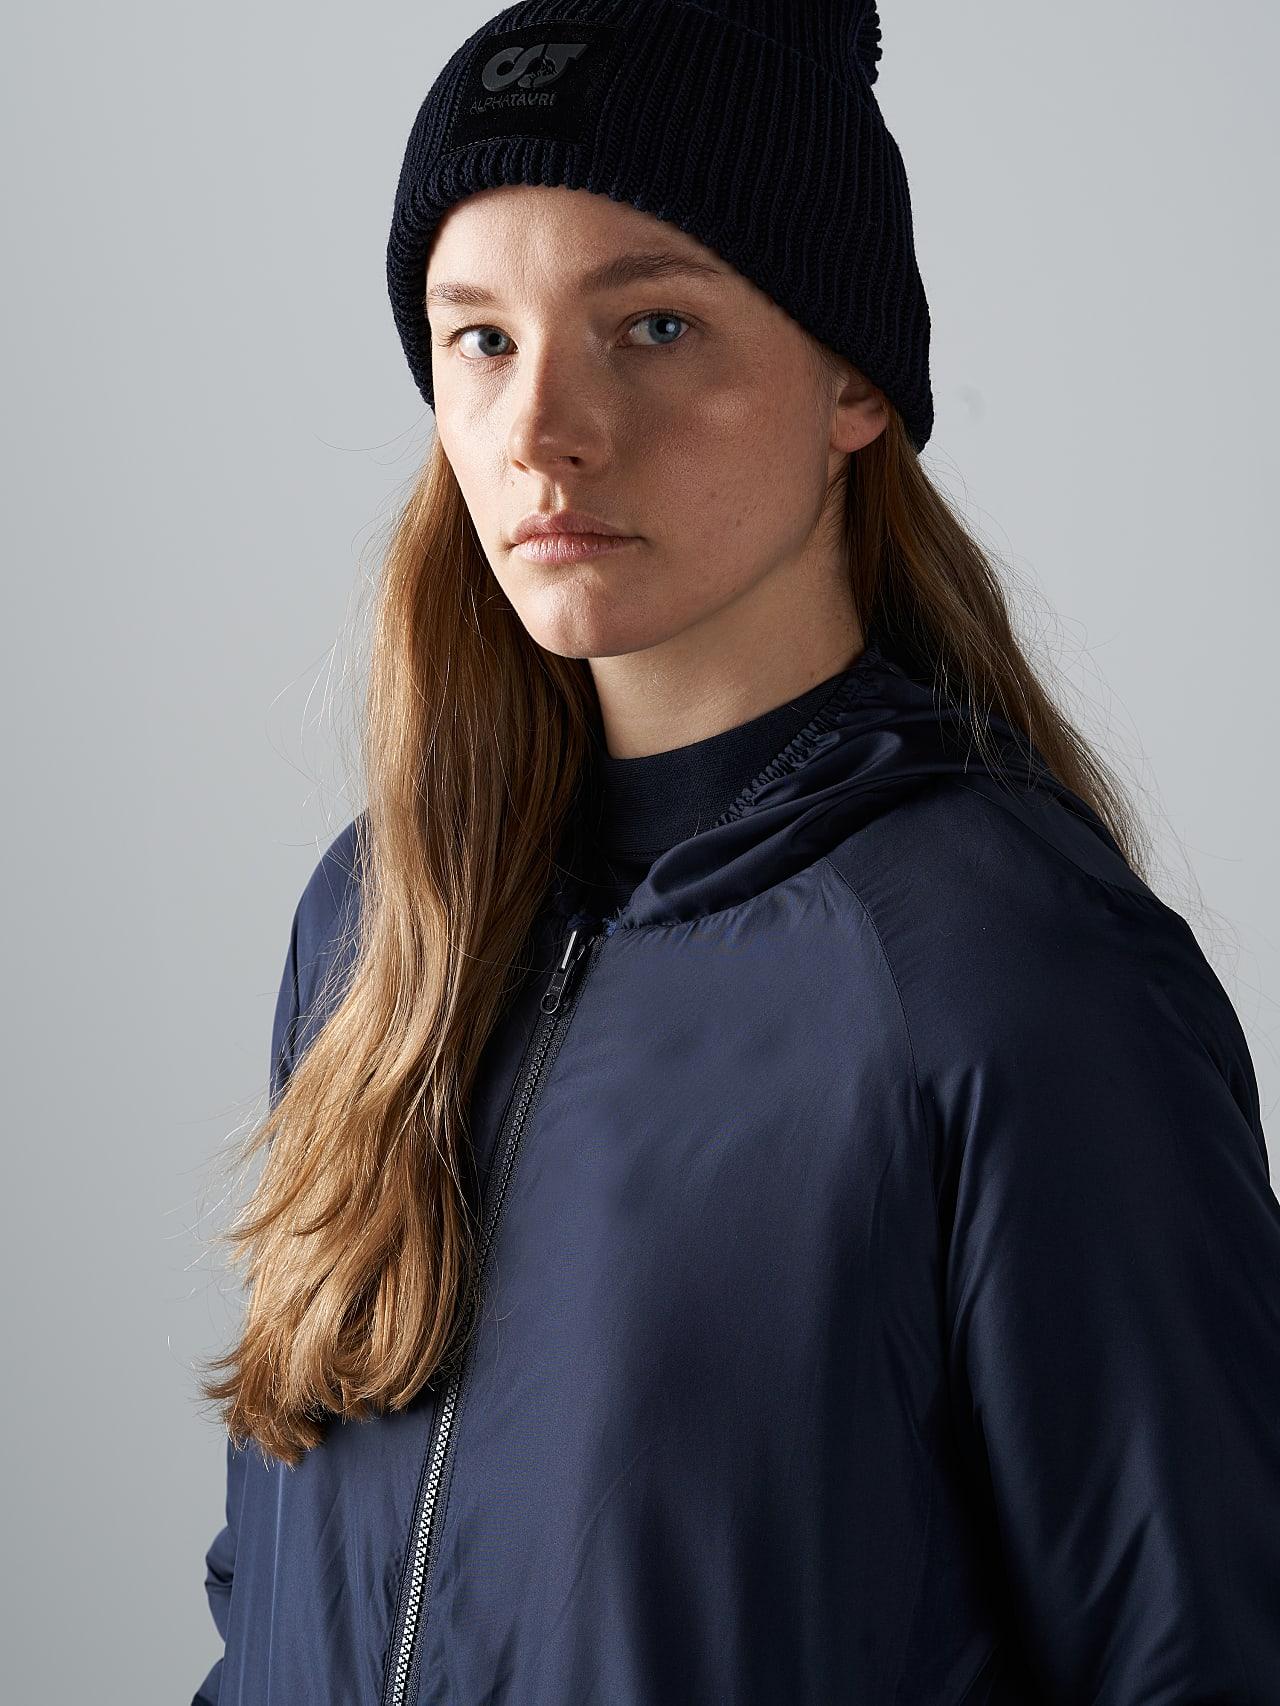 OMANE V1.Y5.02 Reversible Pile Wool Maxi Coat light blue scene7.view.8.name Alpha Tauri